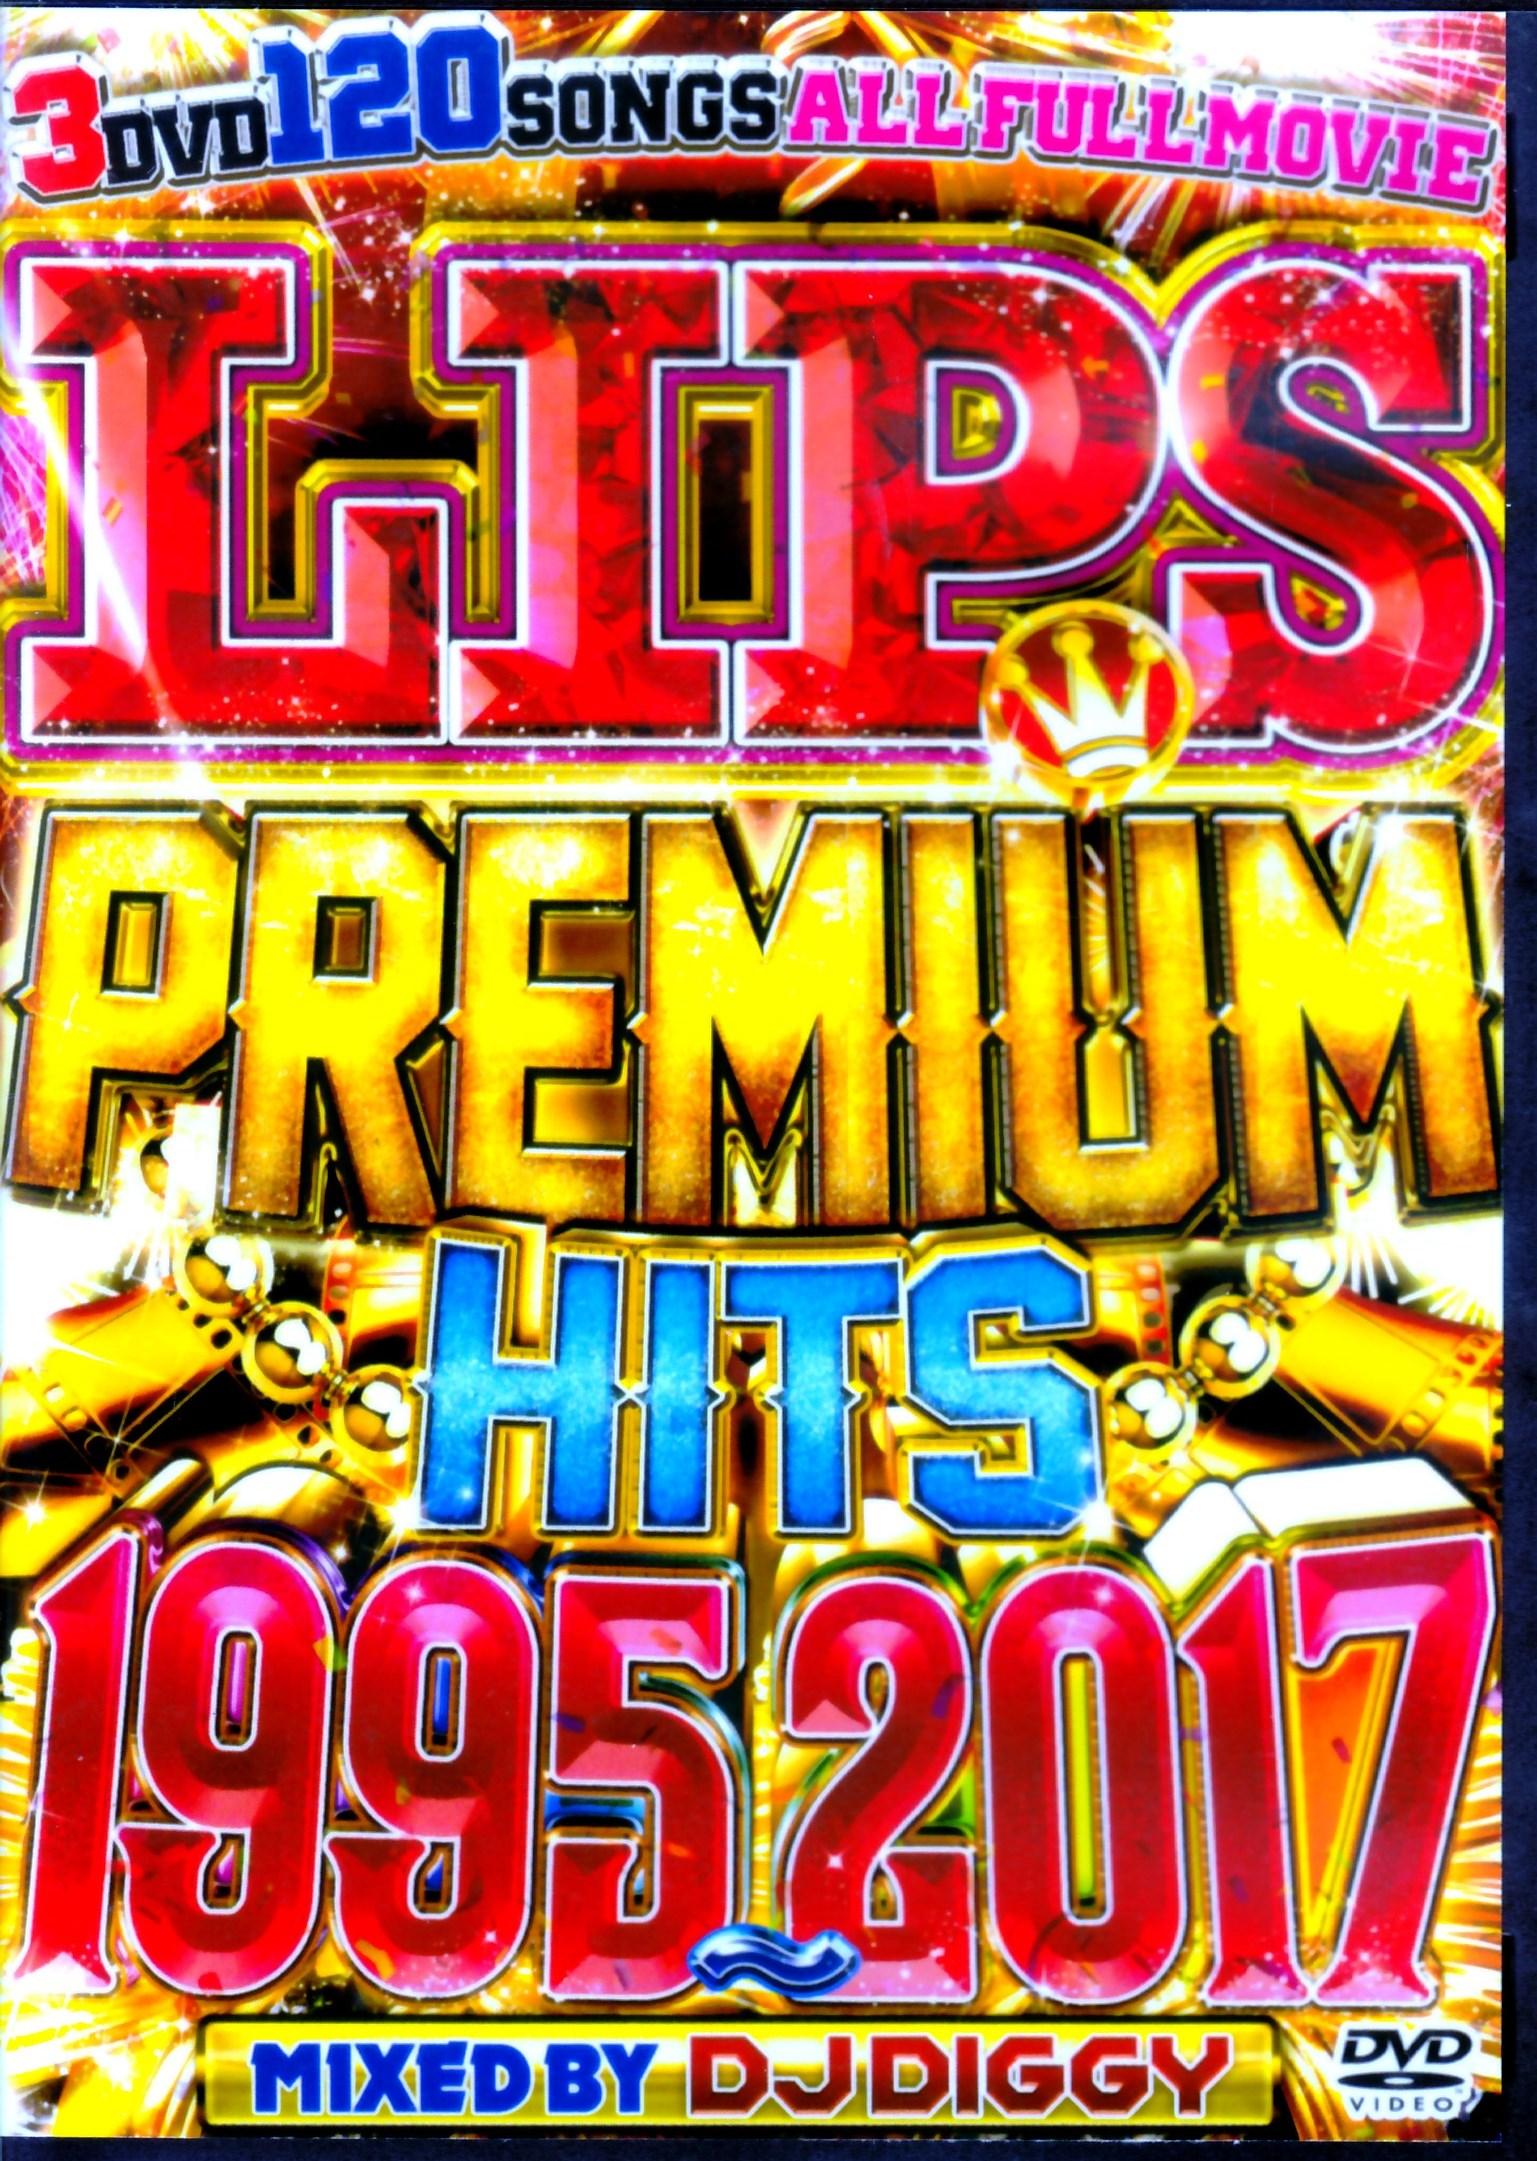 Various Artists Lauryn Hill,Michael Jackson,Maroon 5,LL Cool J/Lips Premium Hits 1995-2017